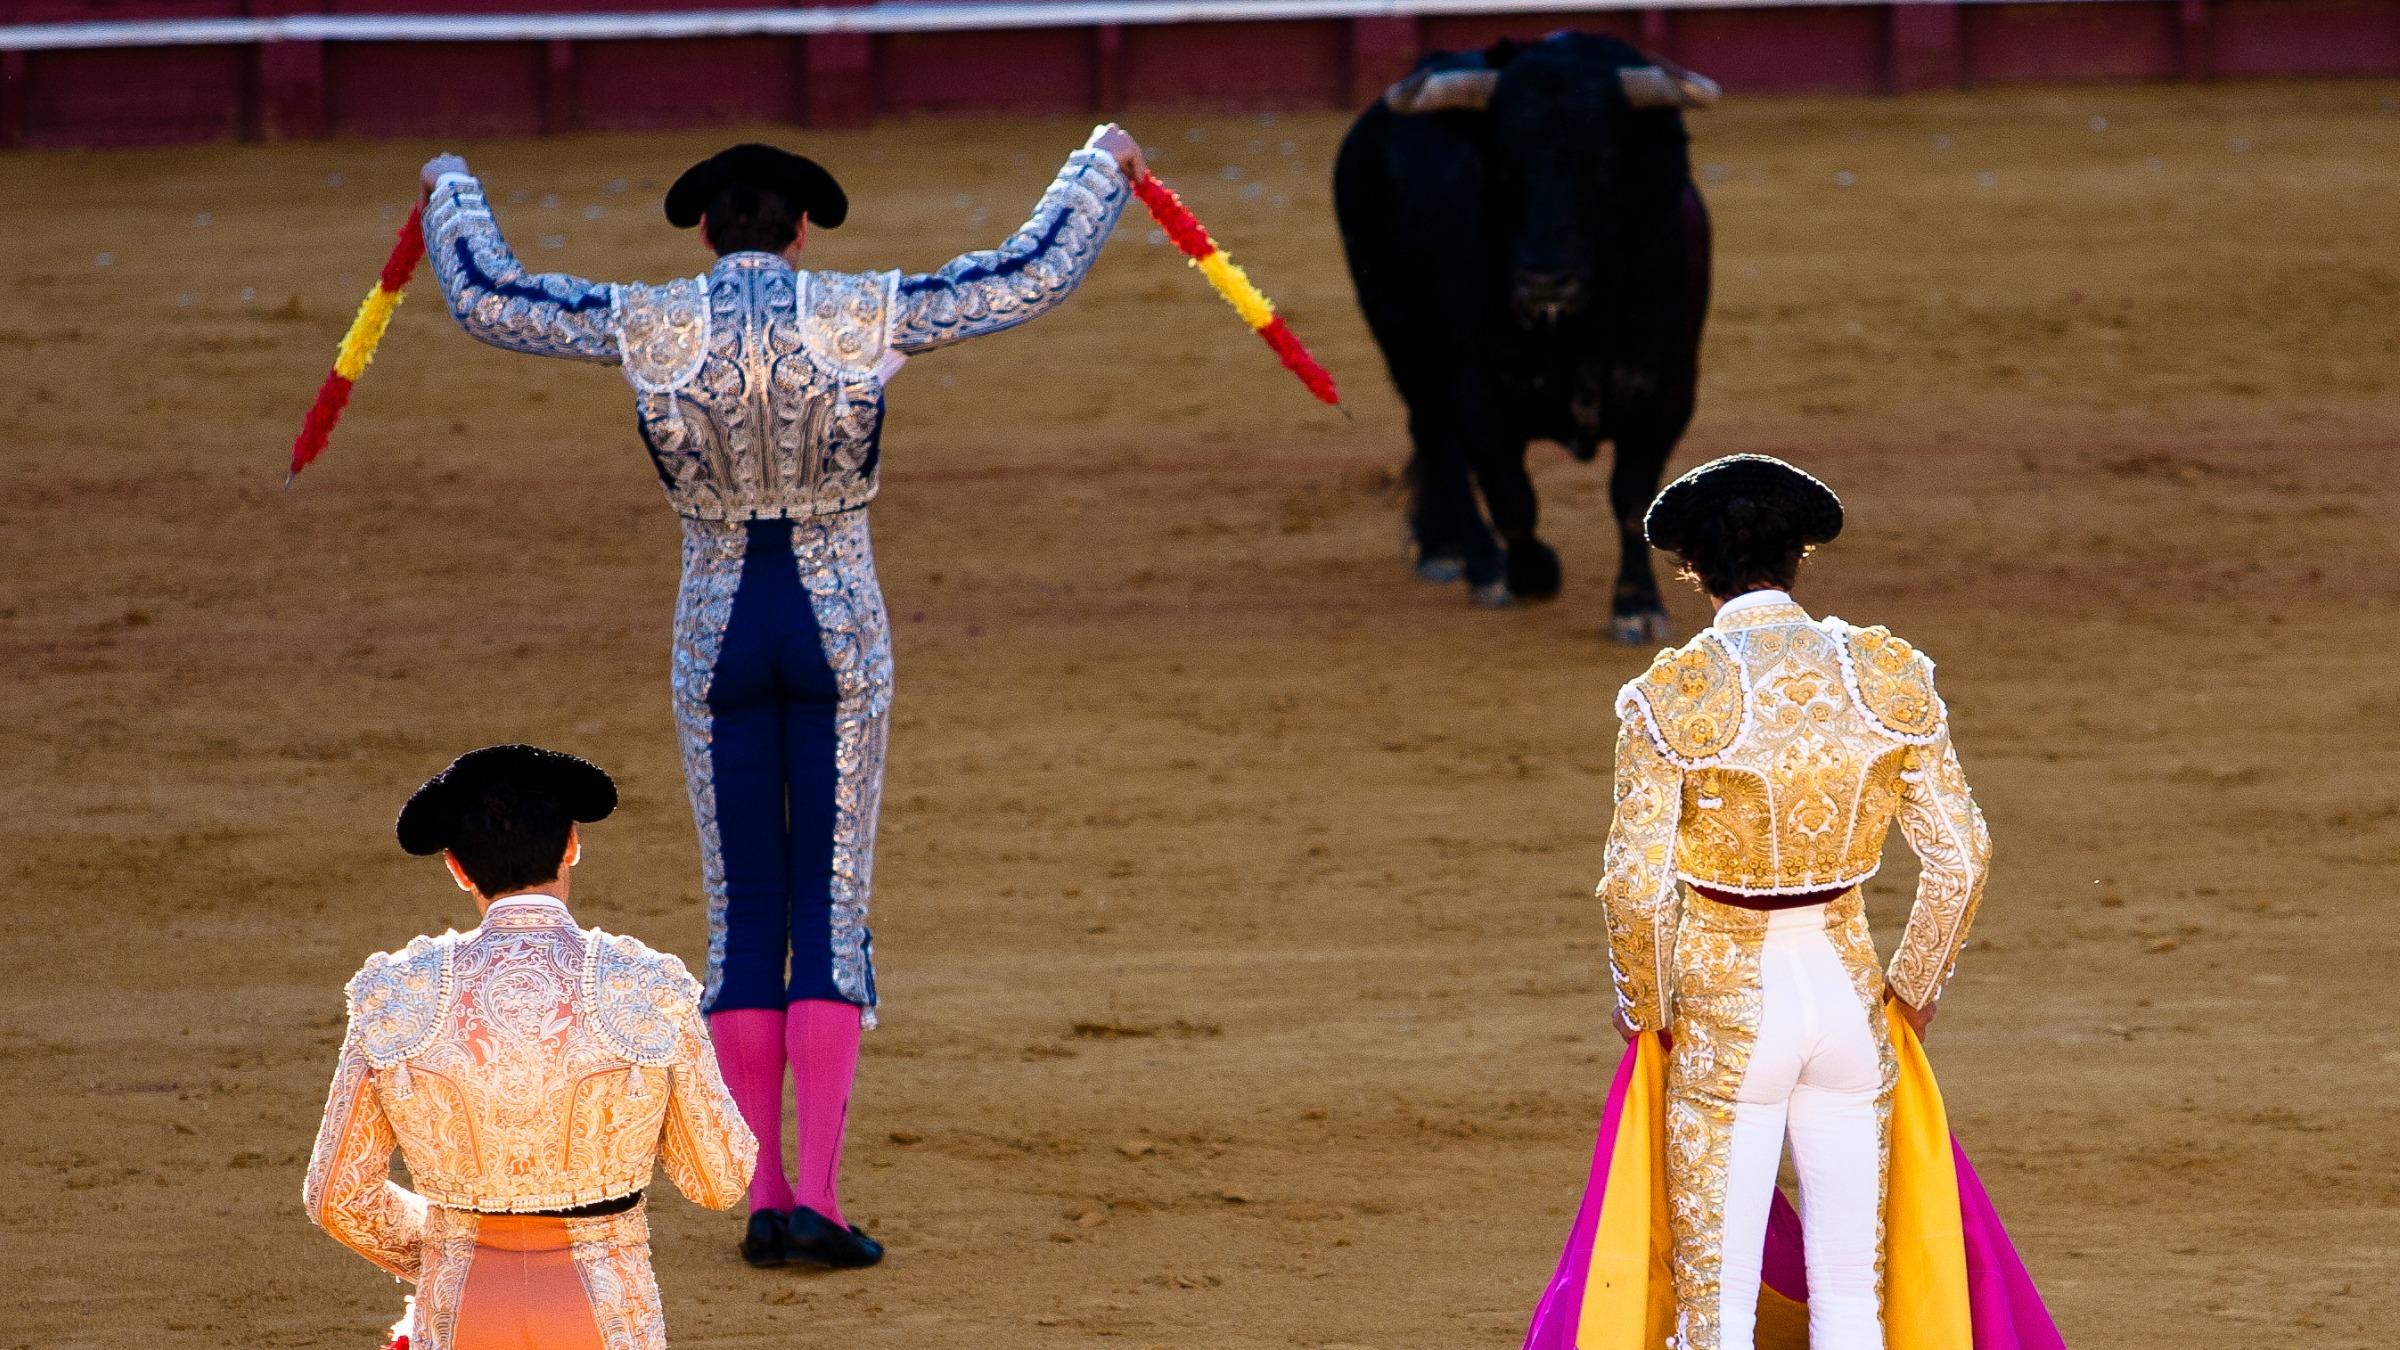 Bullfight Images Stock Photos Vectors